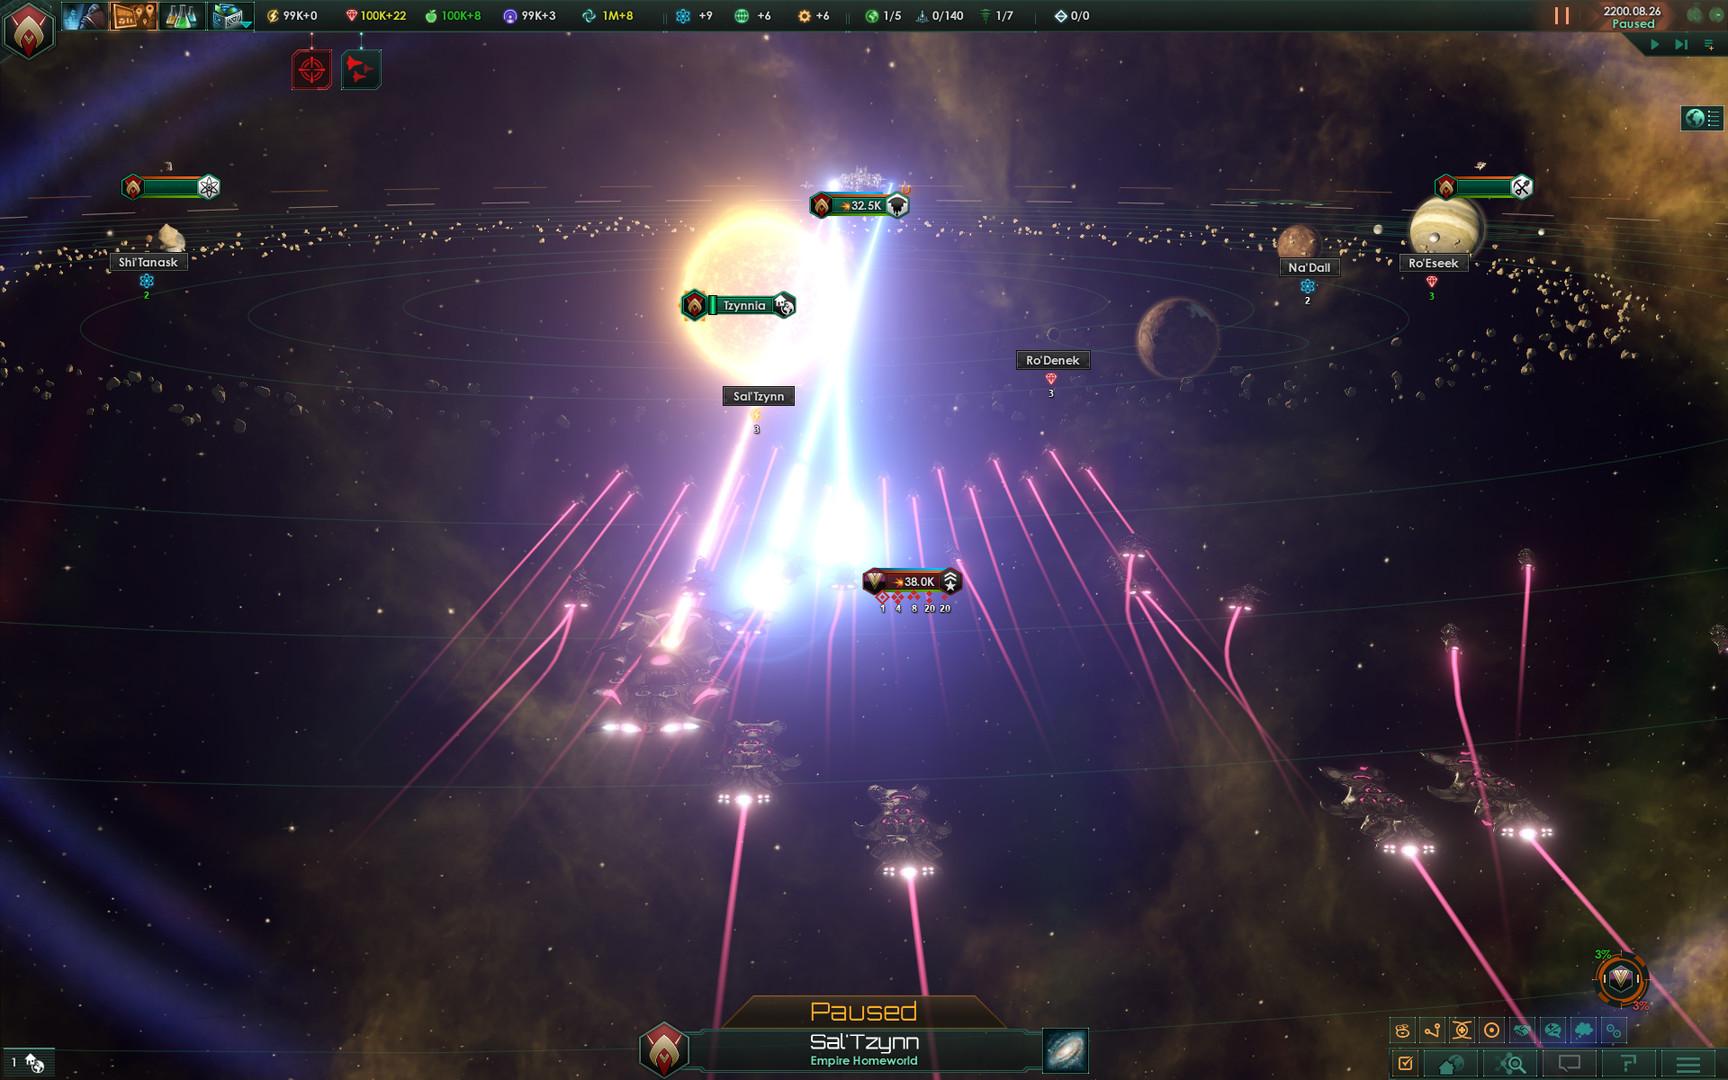 stellaris-galaxy-edition-pc-screenshot-03